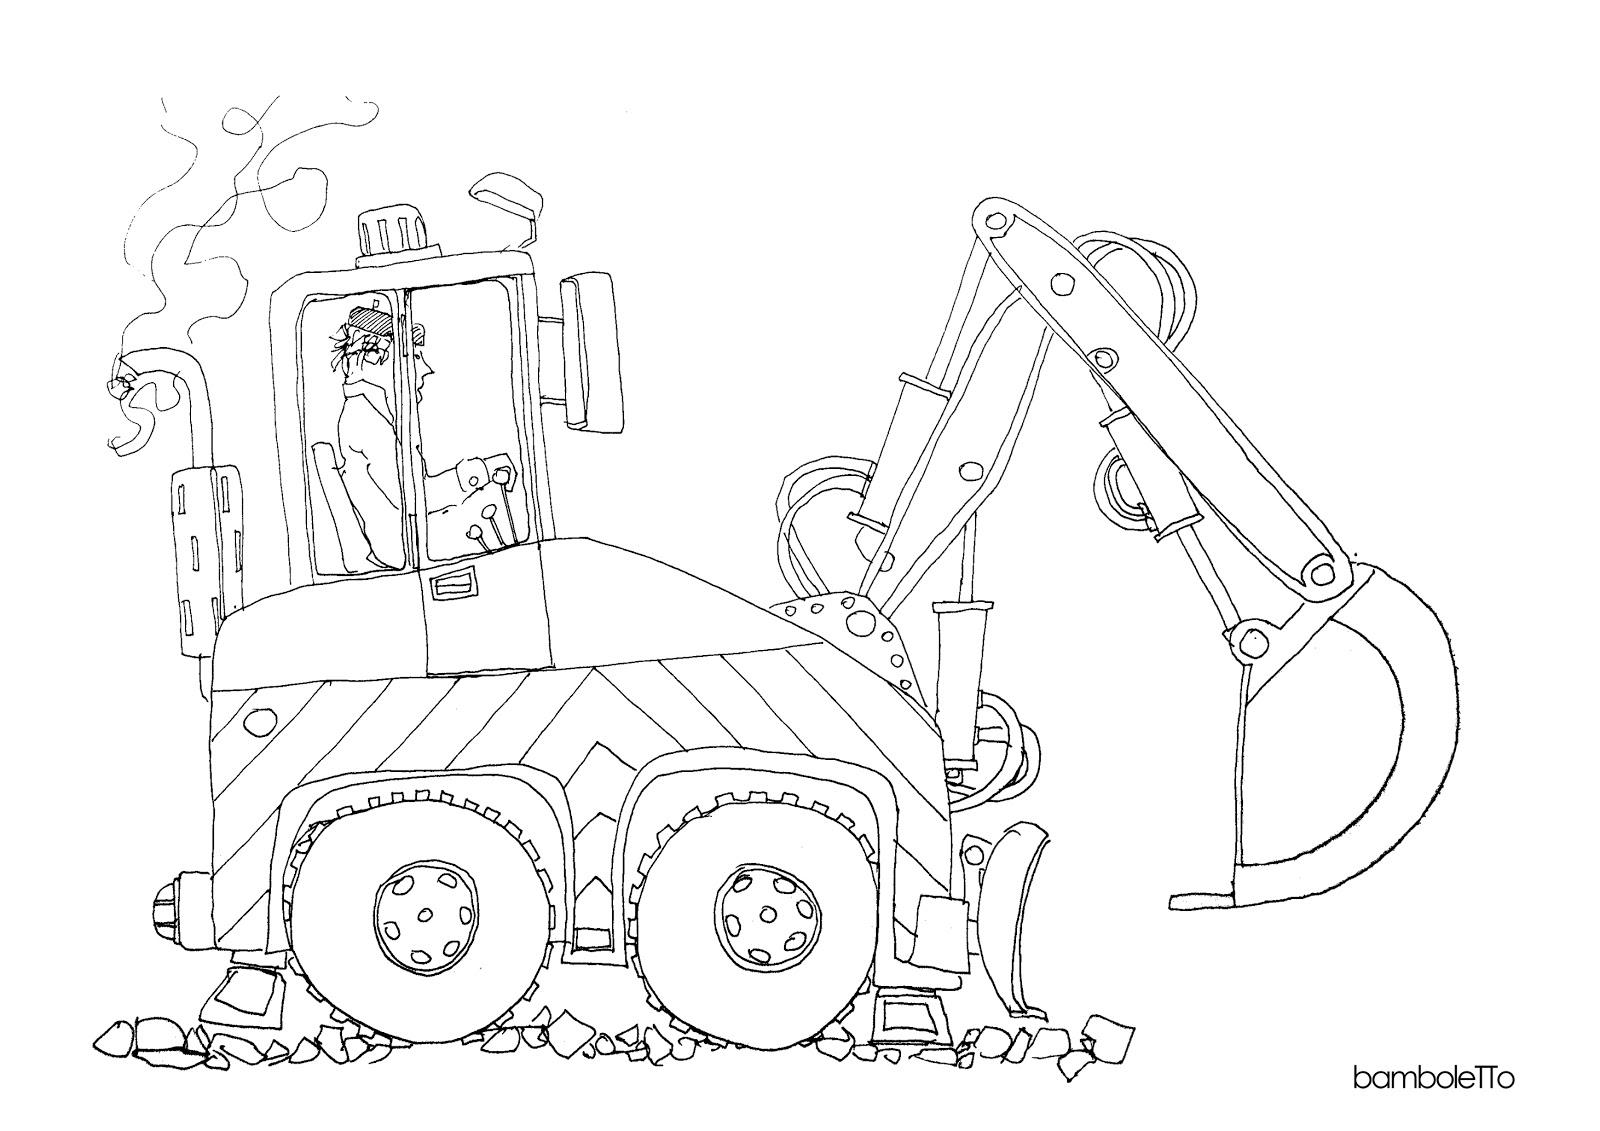 Bamboletto Ilustracje Karetka Koparka I Recenzja Puzzli